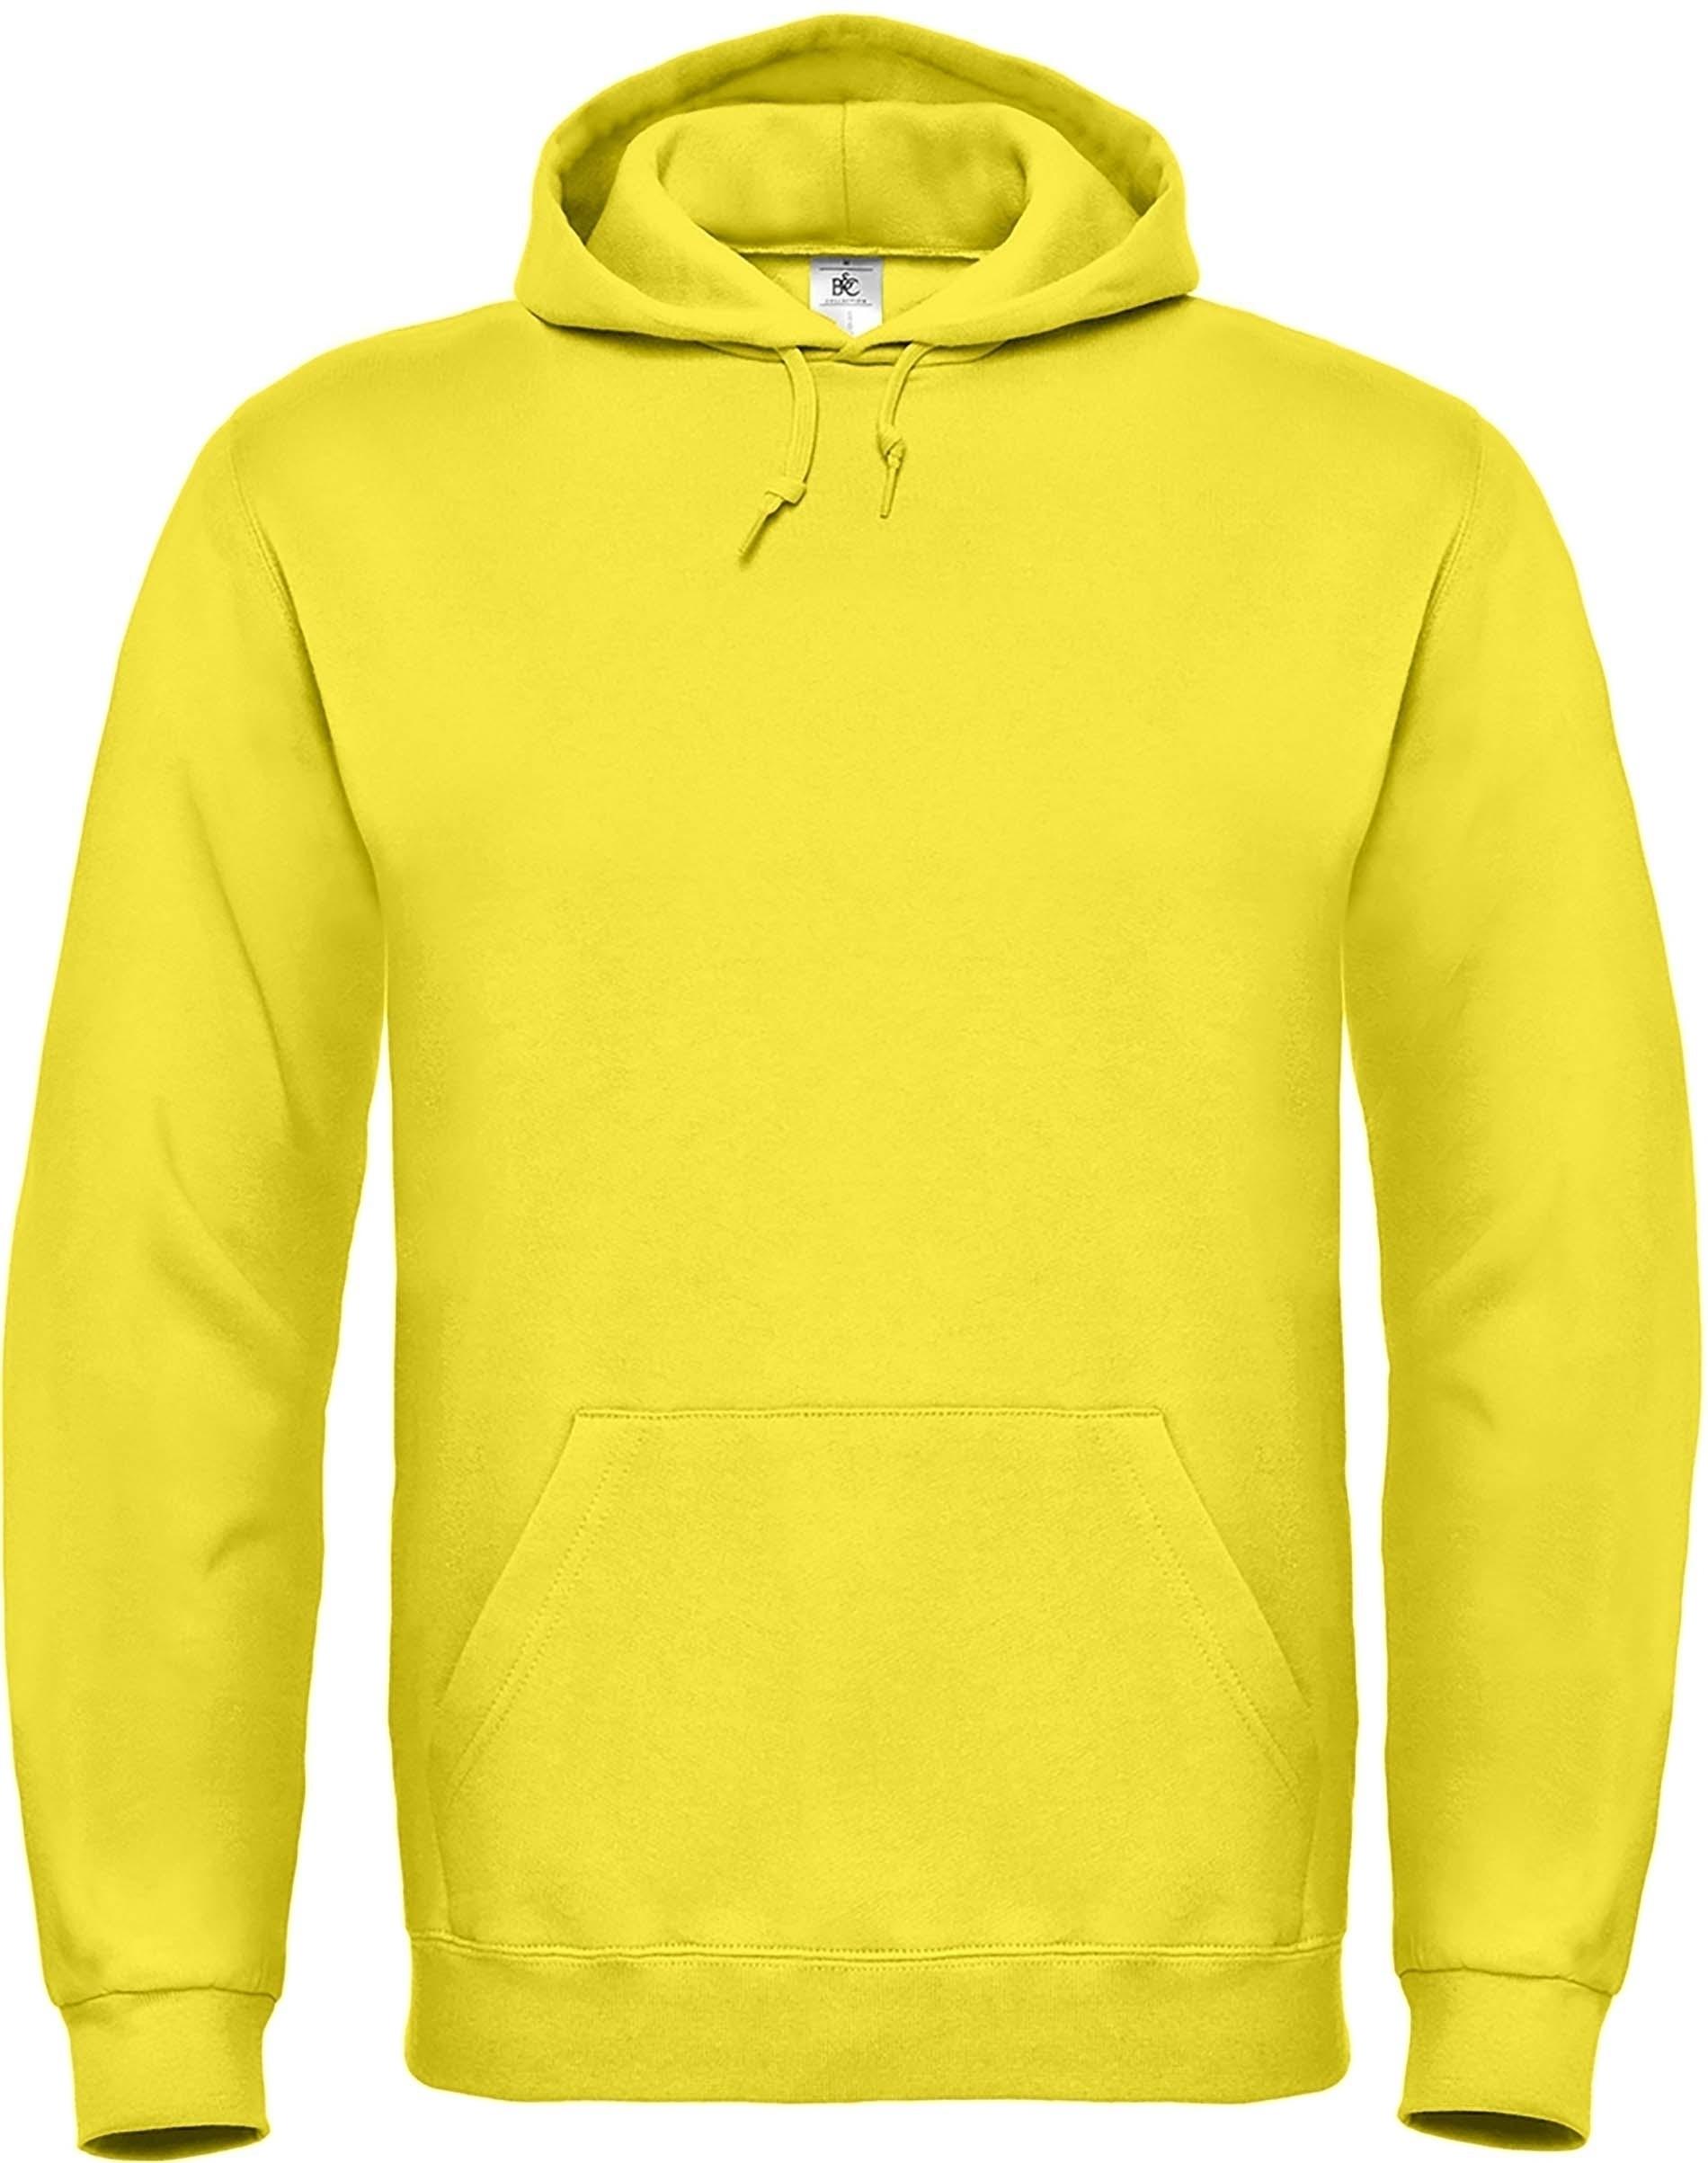 sweat à capuche yellow